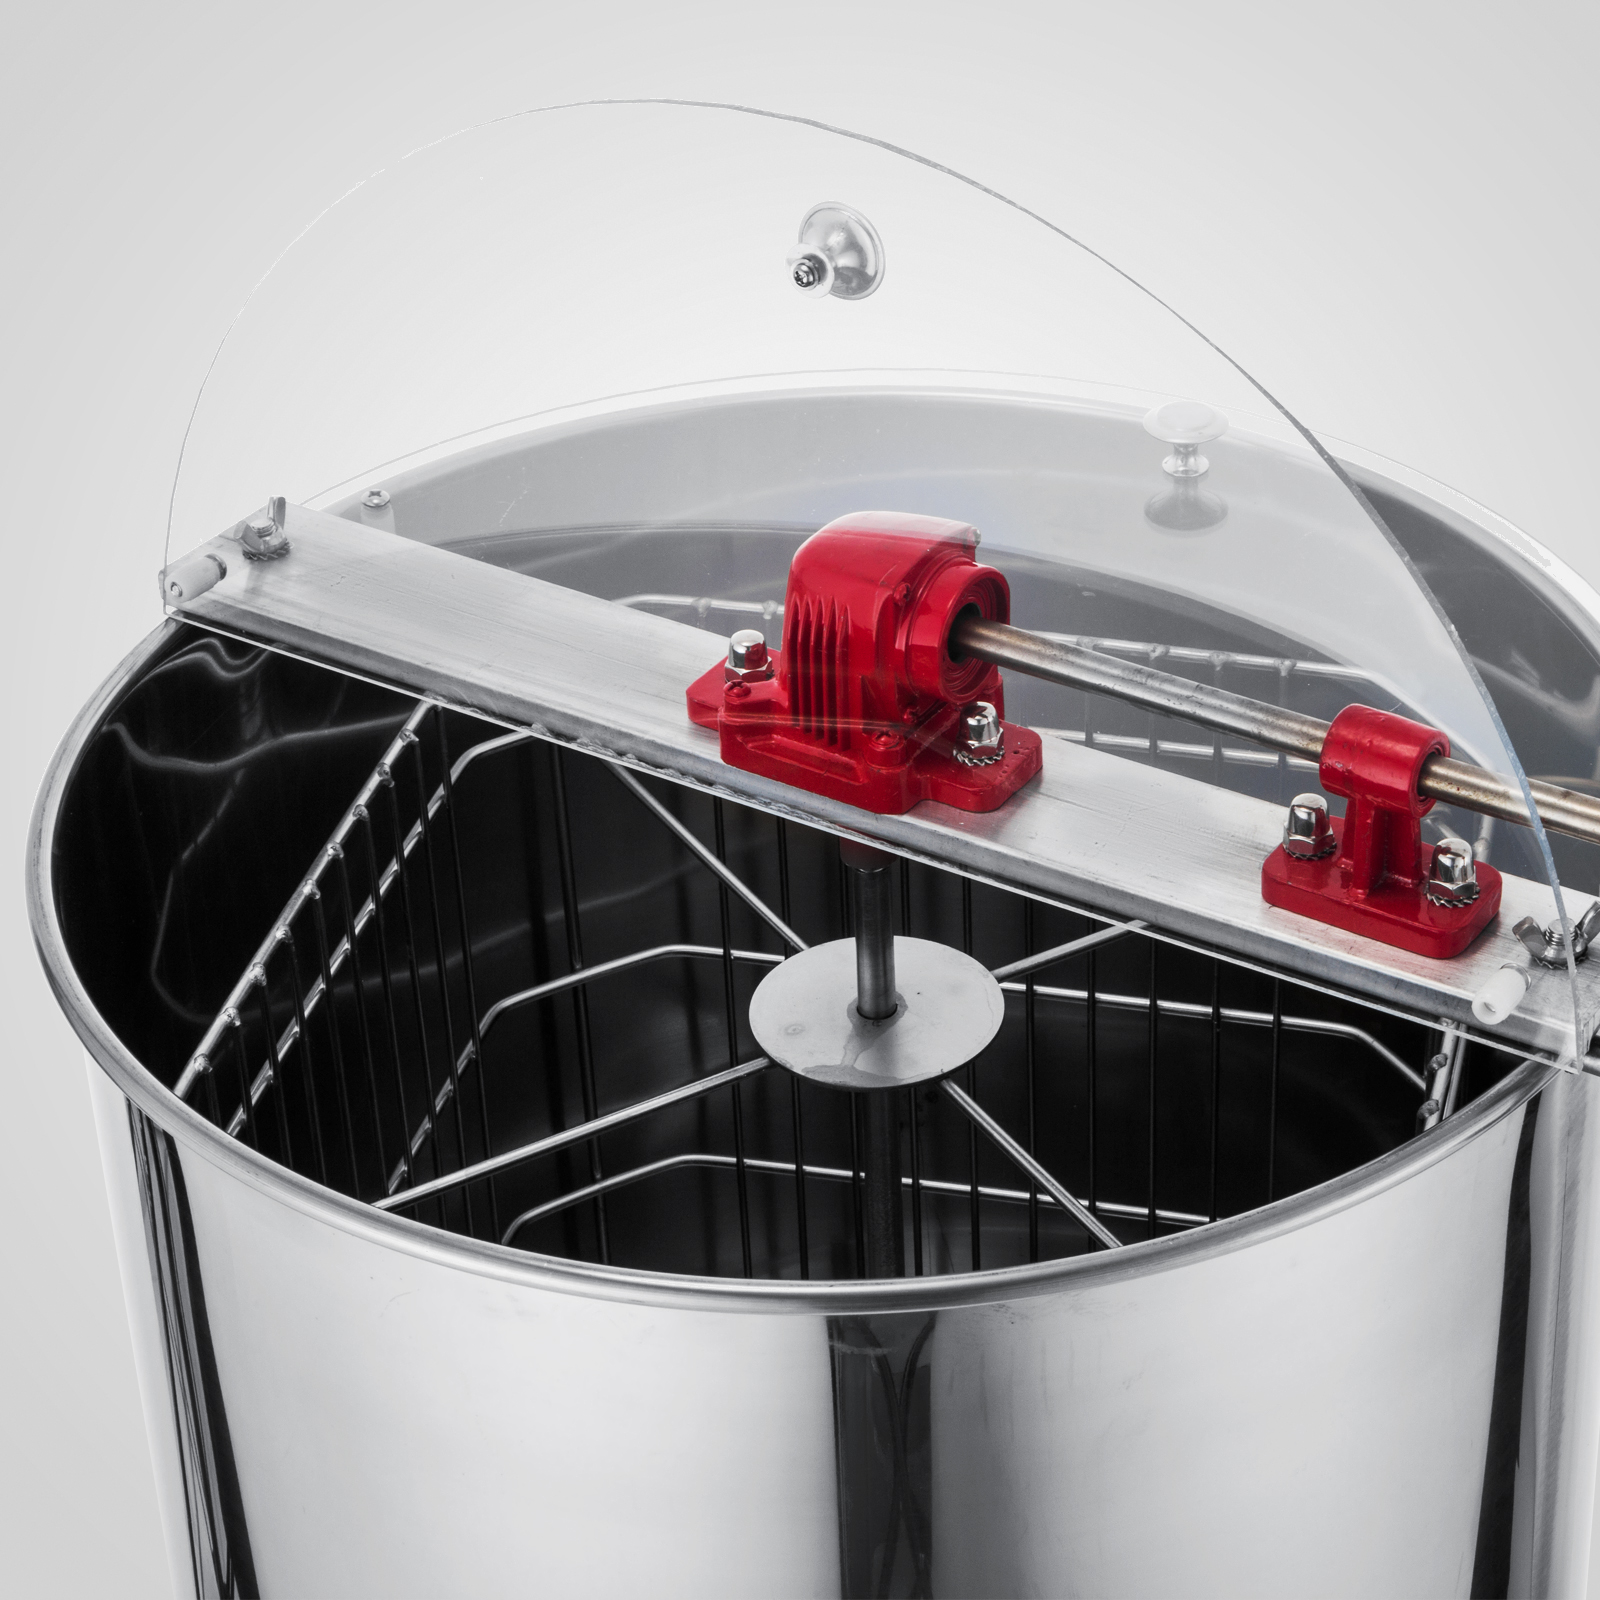 Extracteur-de-Miel-Electrique-manuelle-2-3-4-Cadres-En-Acier-Inox-Centrifugeuse miniature 79